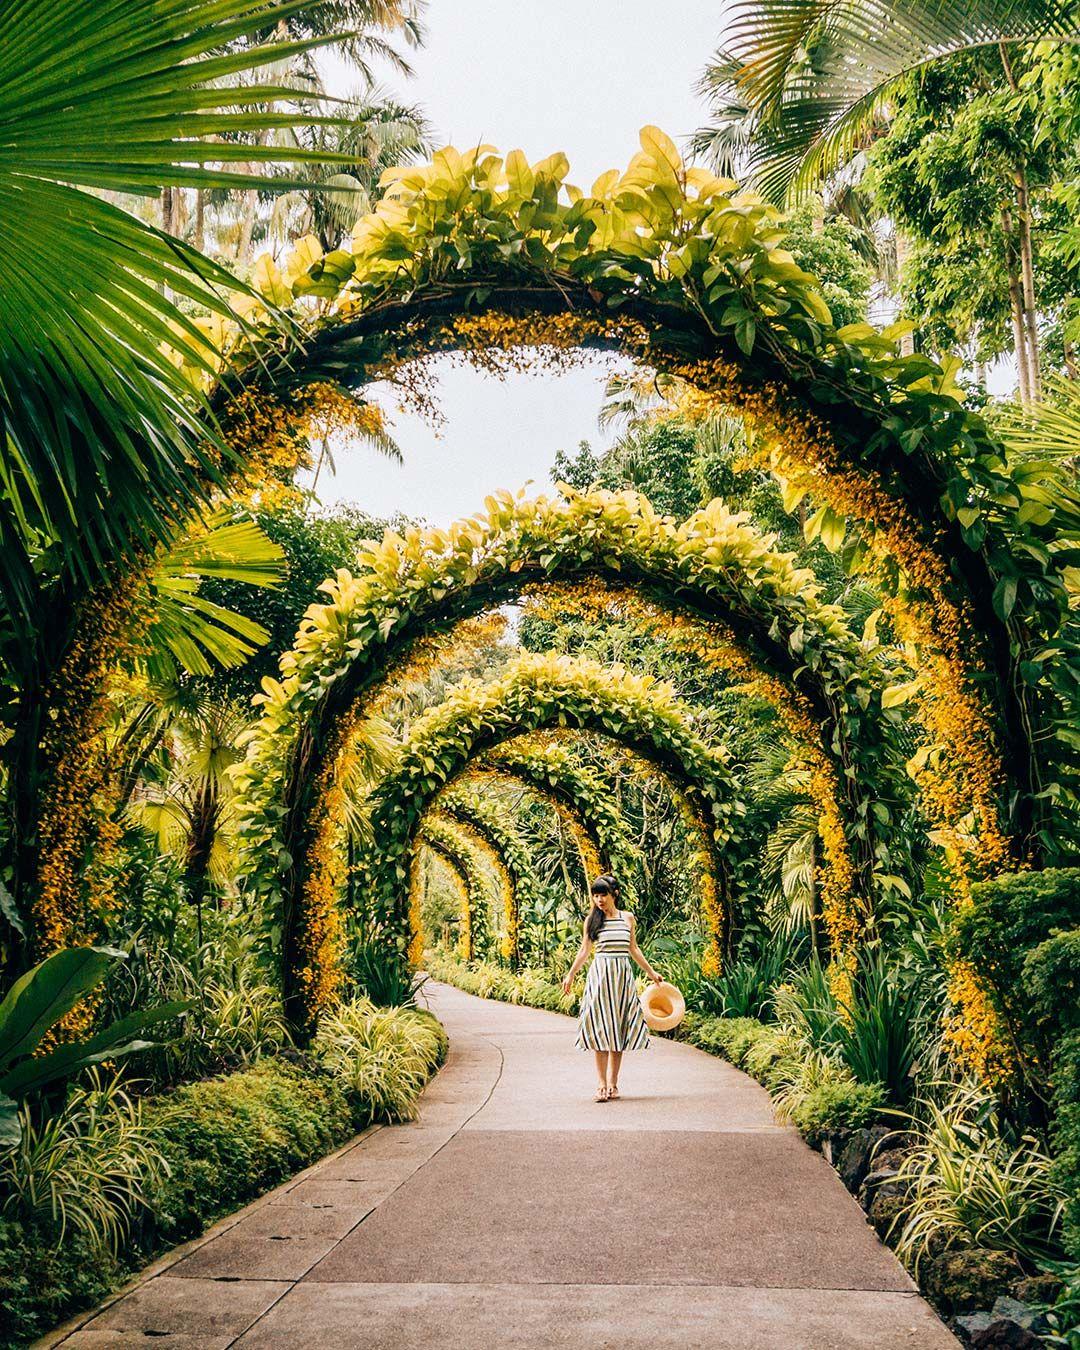 Why You Should Visit the Singapore Botanic Gardens